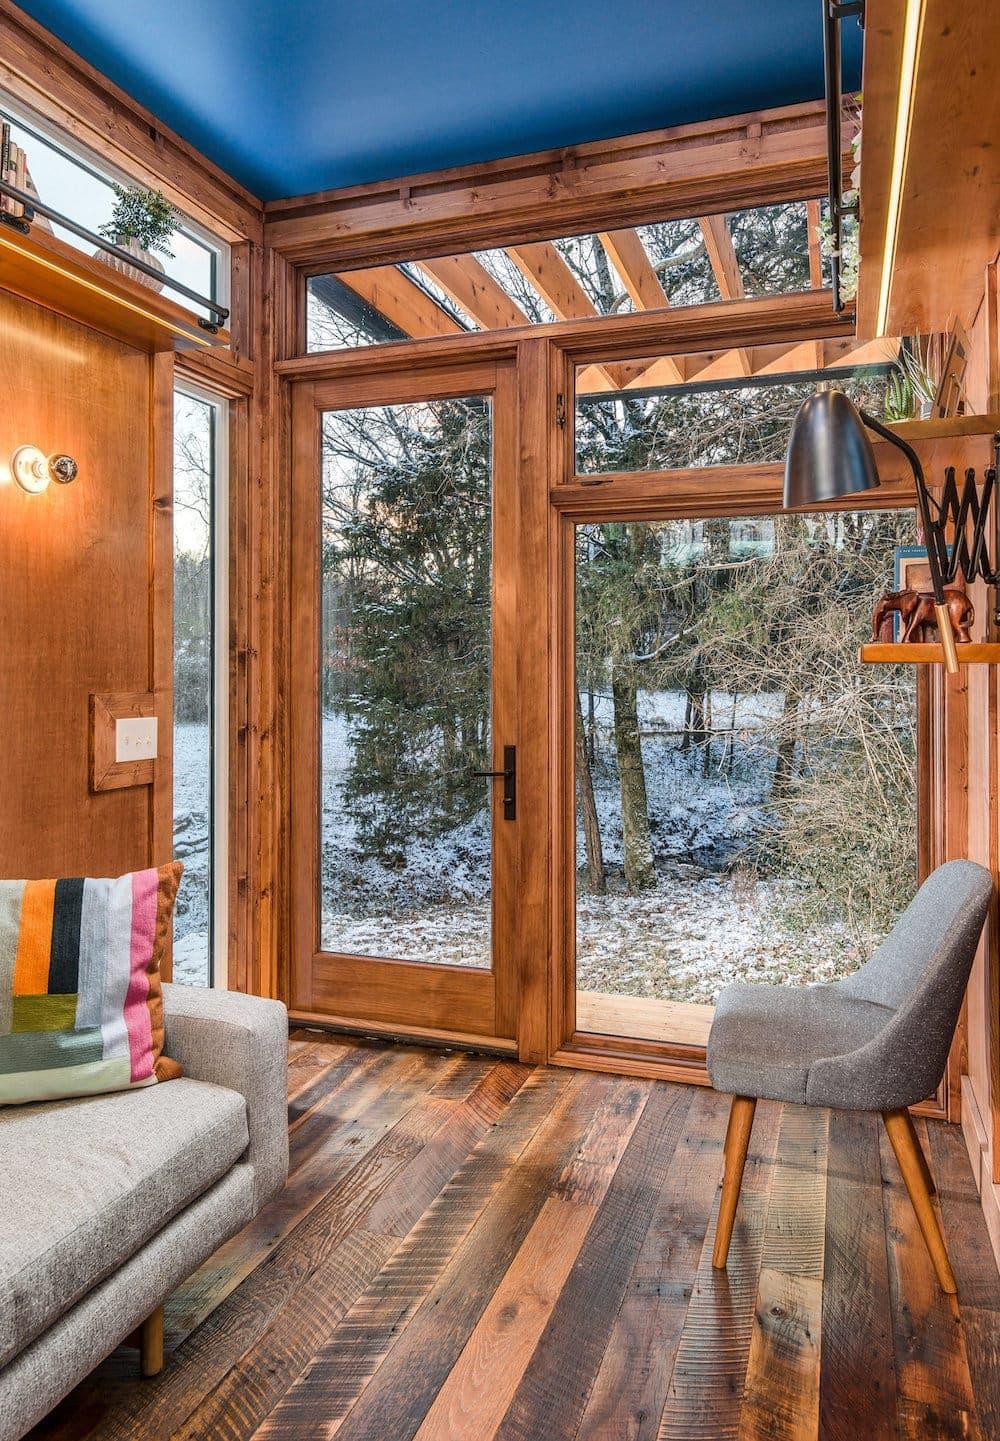 Ein sonderbares Refugium inmitten der Natur: The Cornelia Tiny House 3